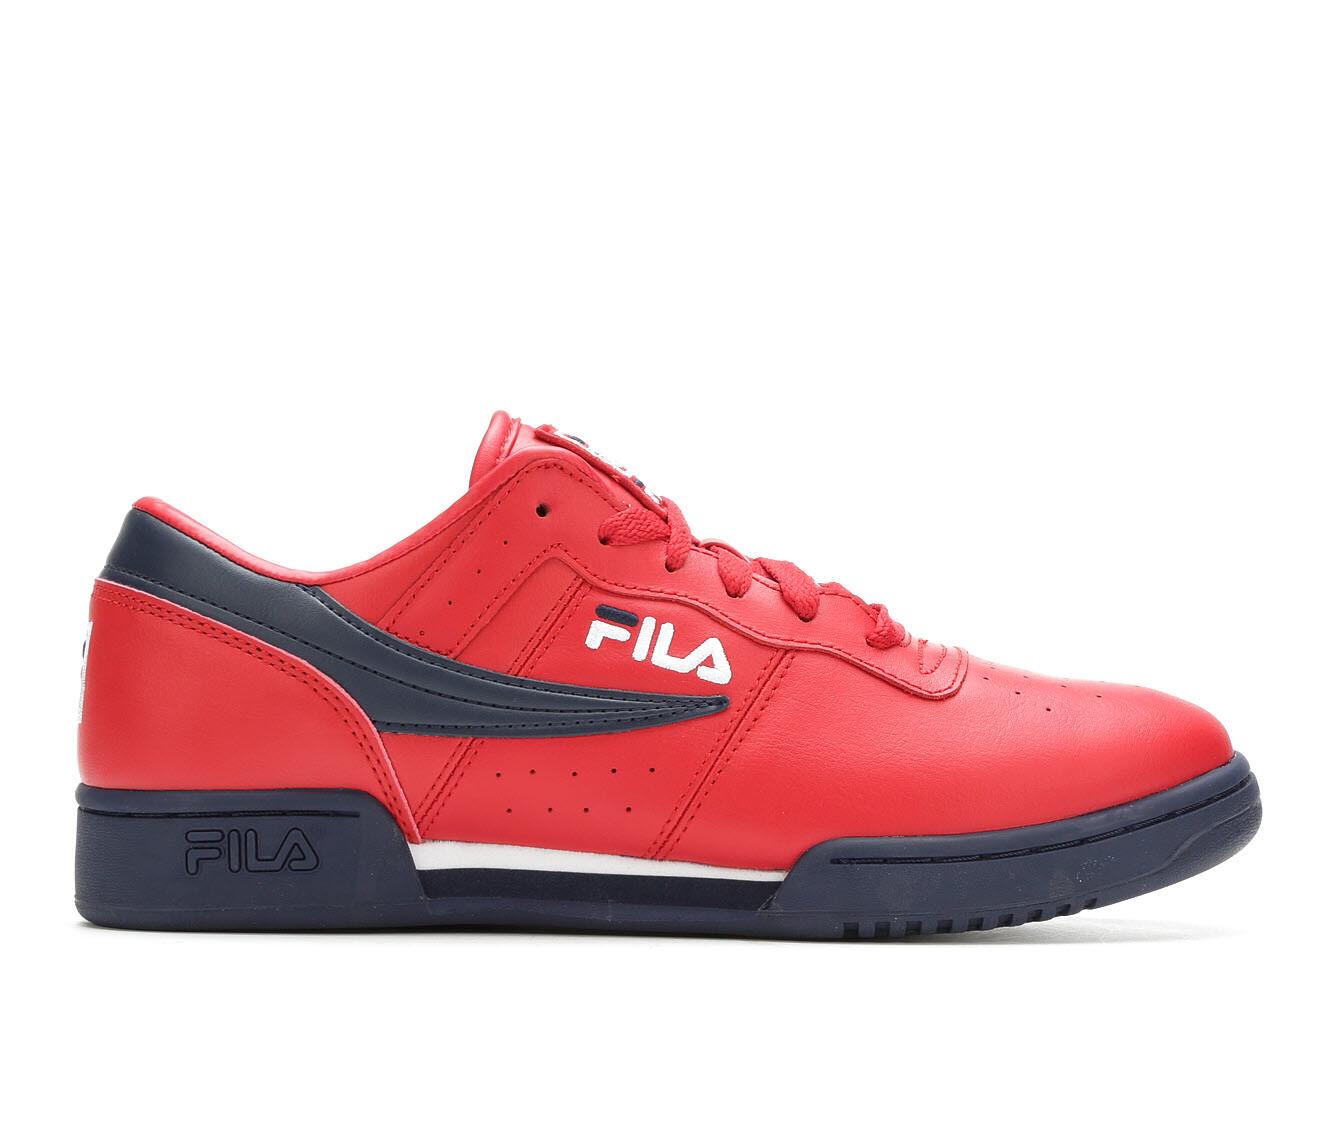 Men's Fila Original Fitness Retro Sneakers Red/Nvy/Wht